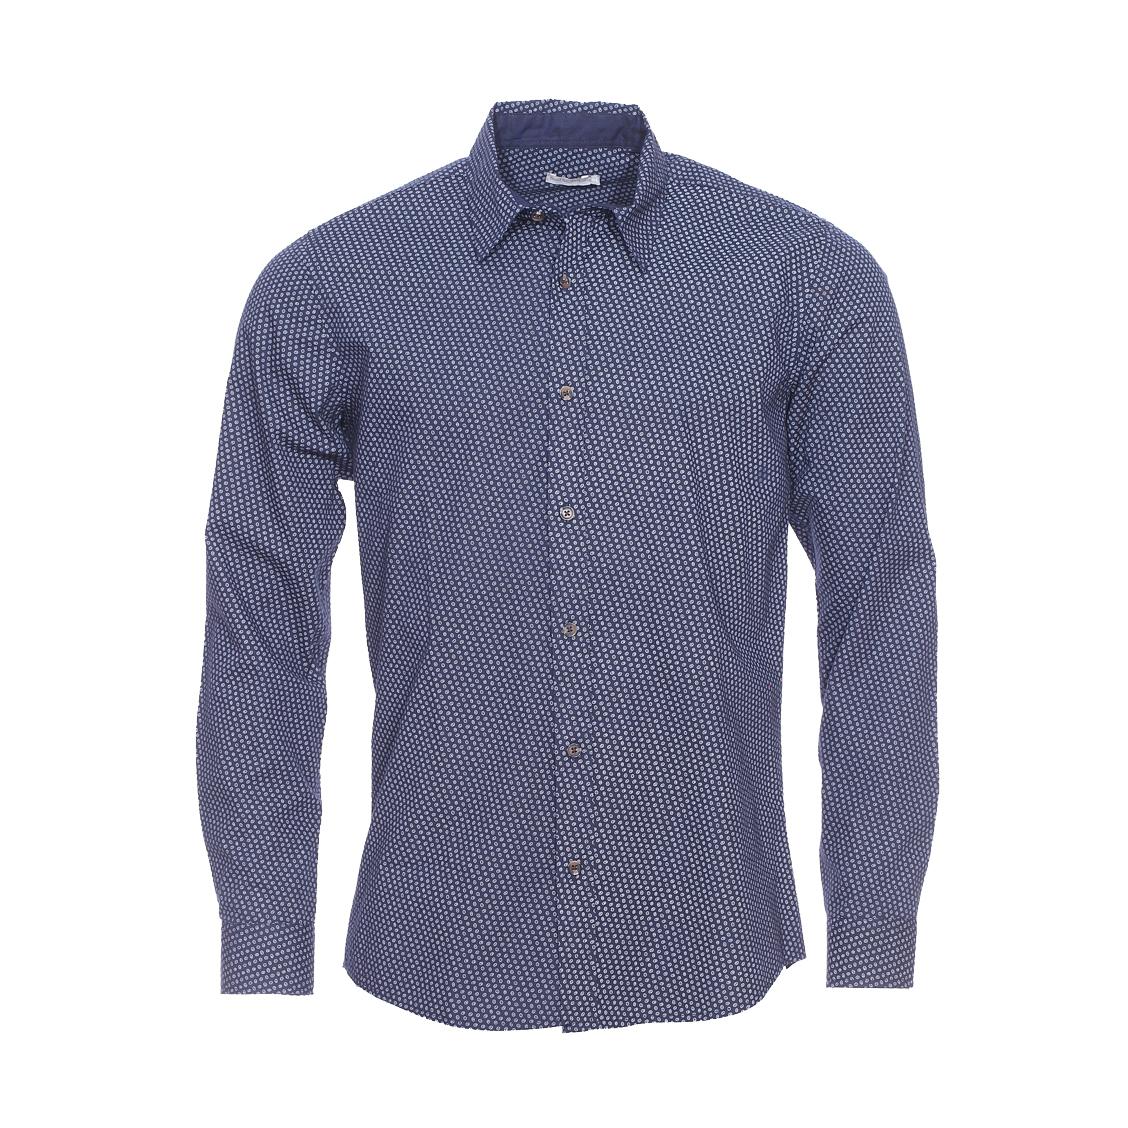 Chemise ajustée  bleu marine à motifs ovales blancs